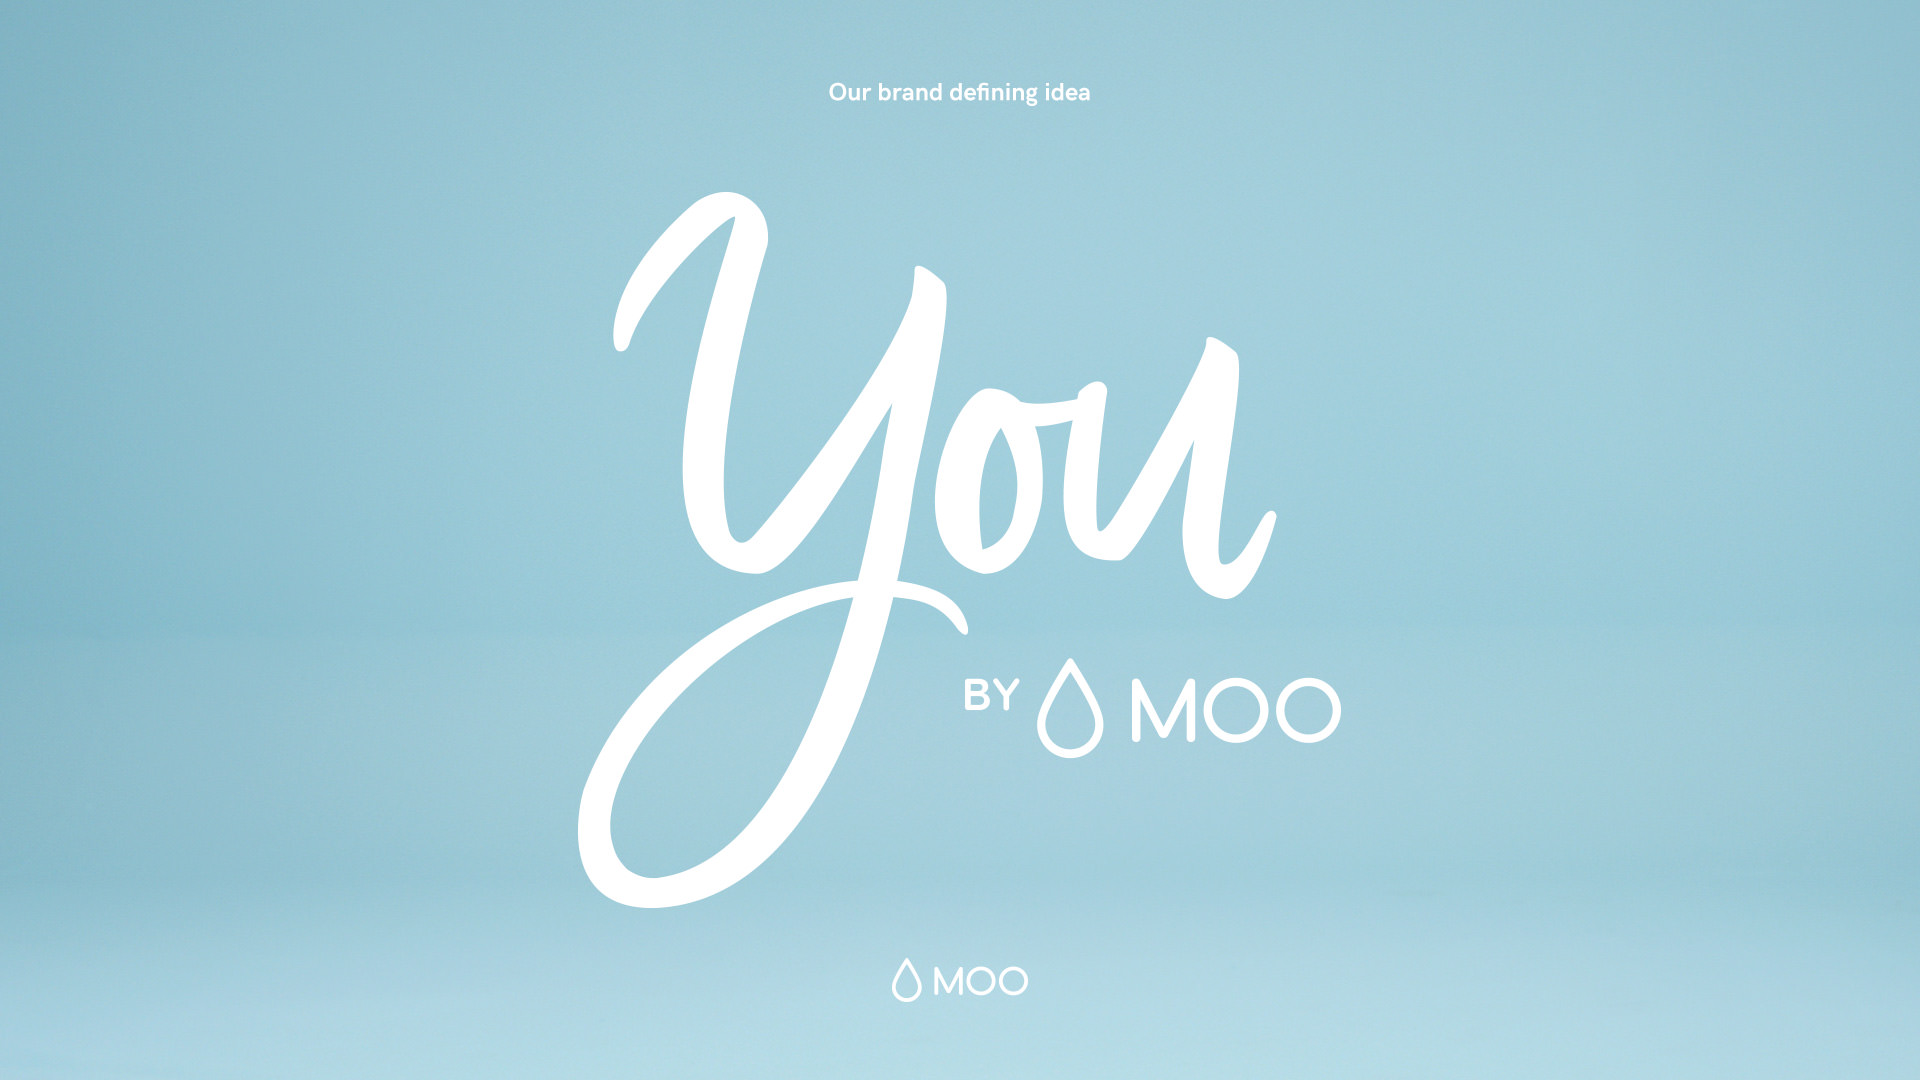 moo_cs_00.jpg